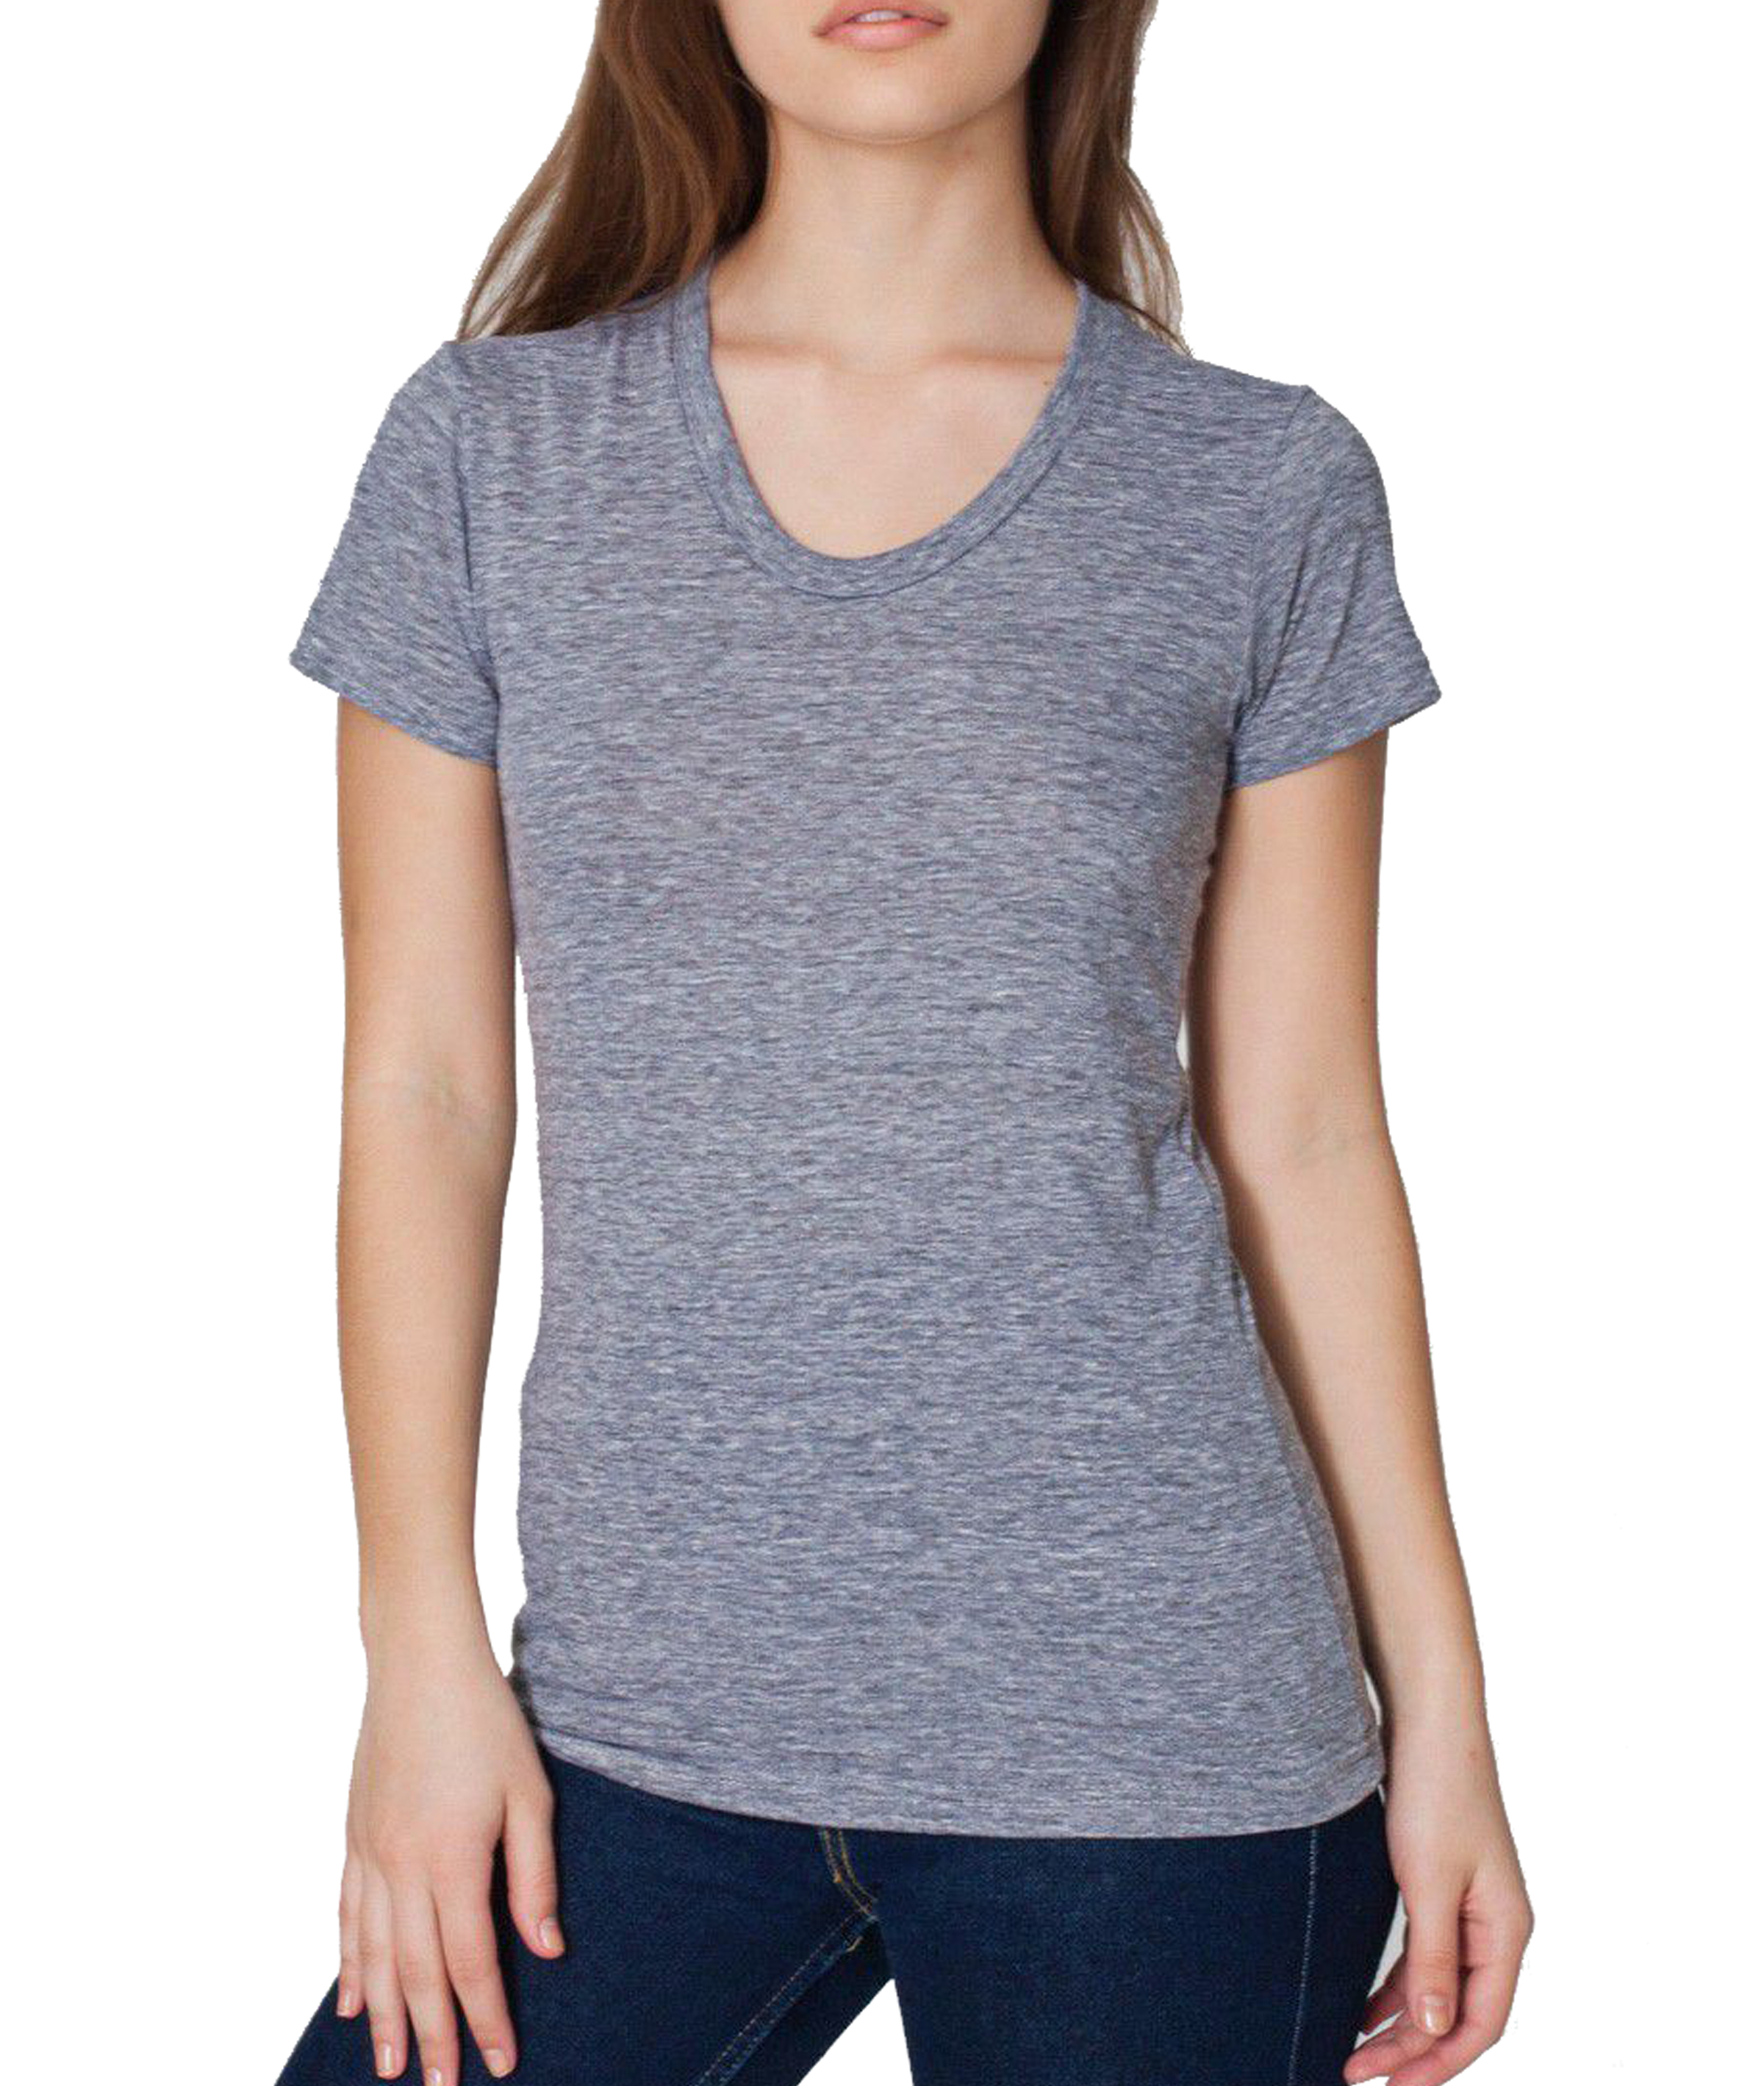 American Apparel Ladies' Triblend T-Shirt